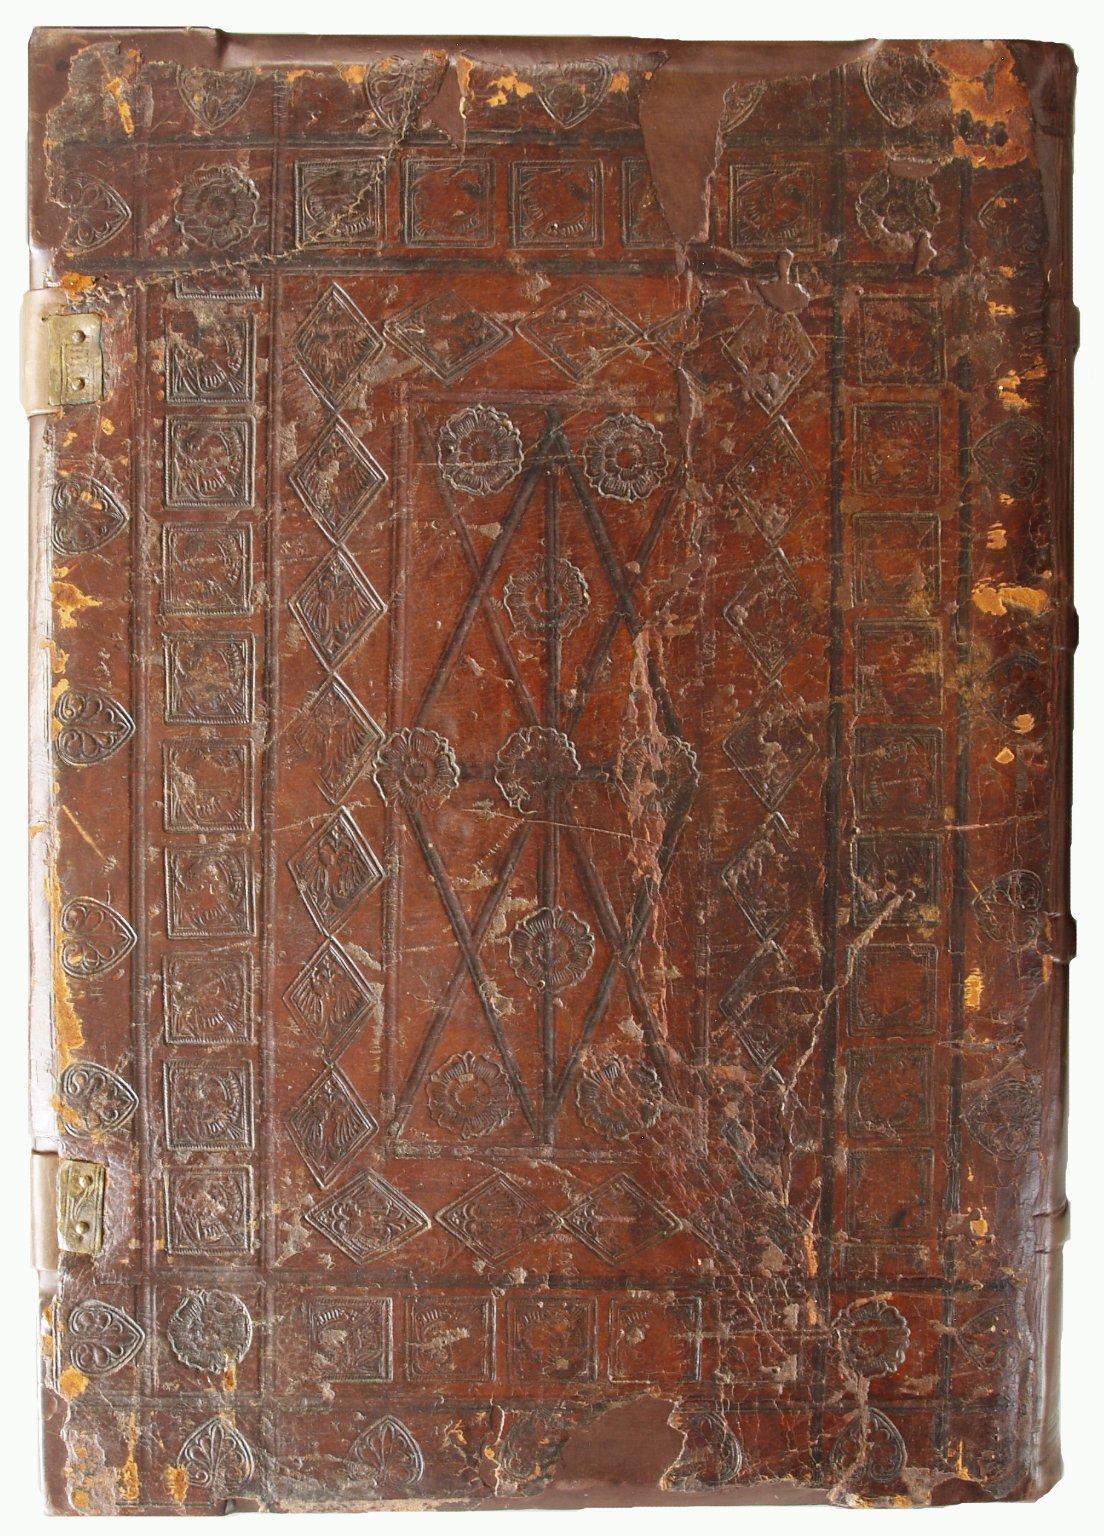 Back cover, INC R8 volume 1.